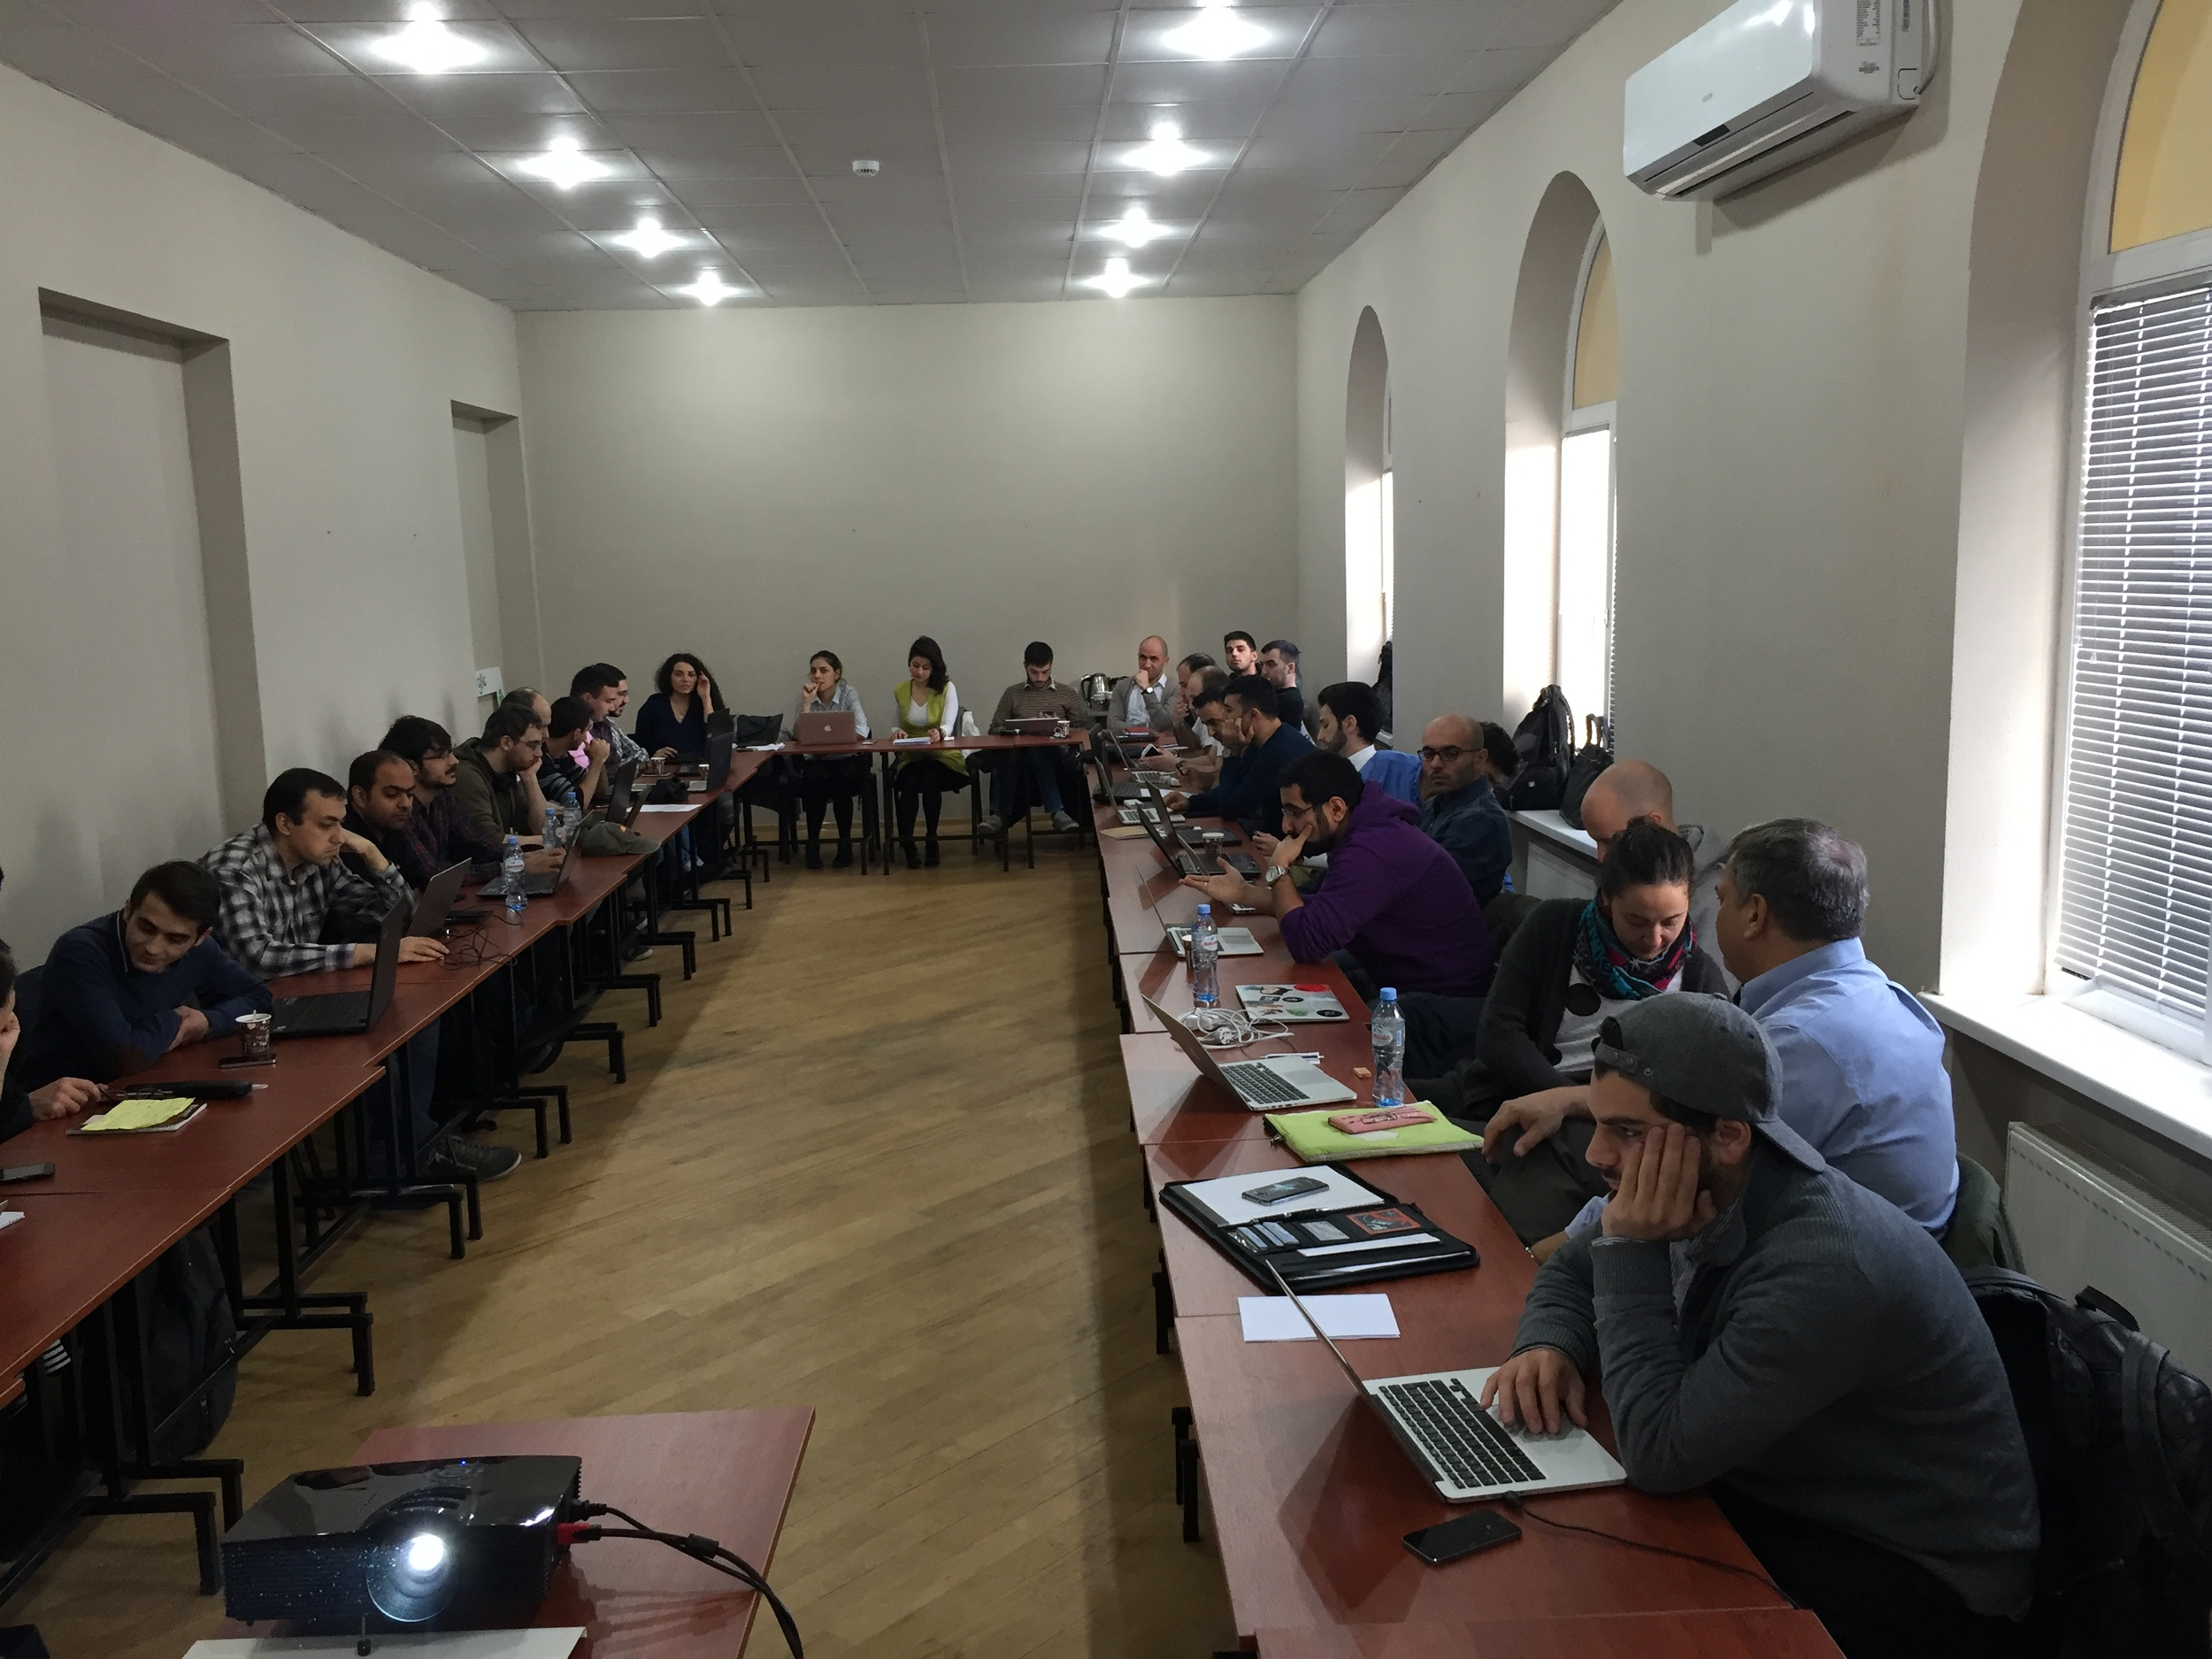 ABOVE: Traction Camp Tbilisi event participants (Nov 27-29)